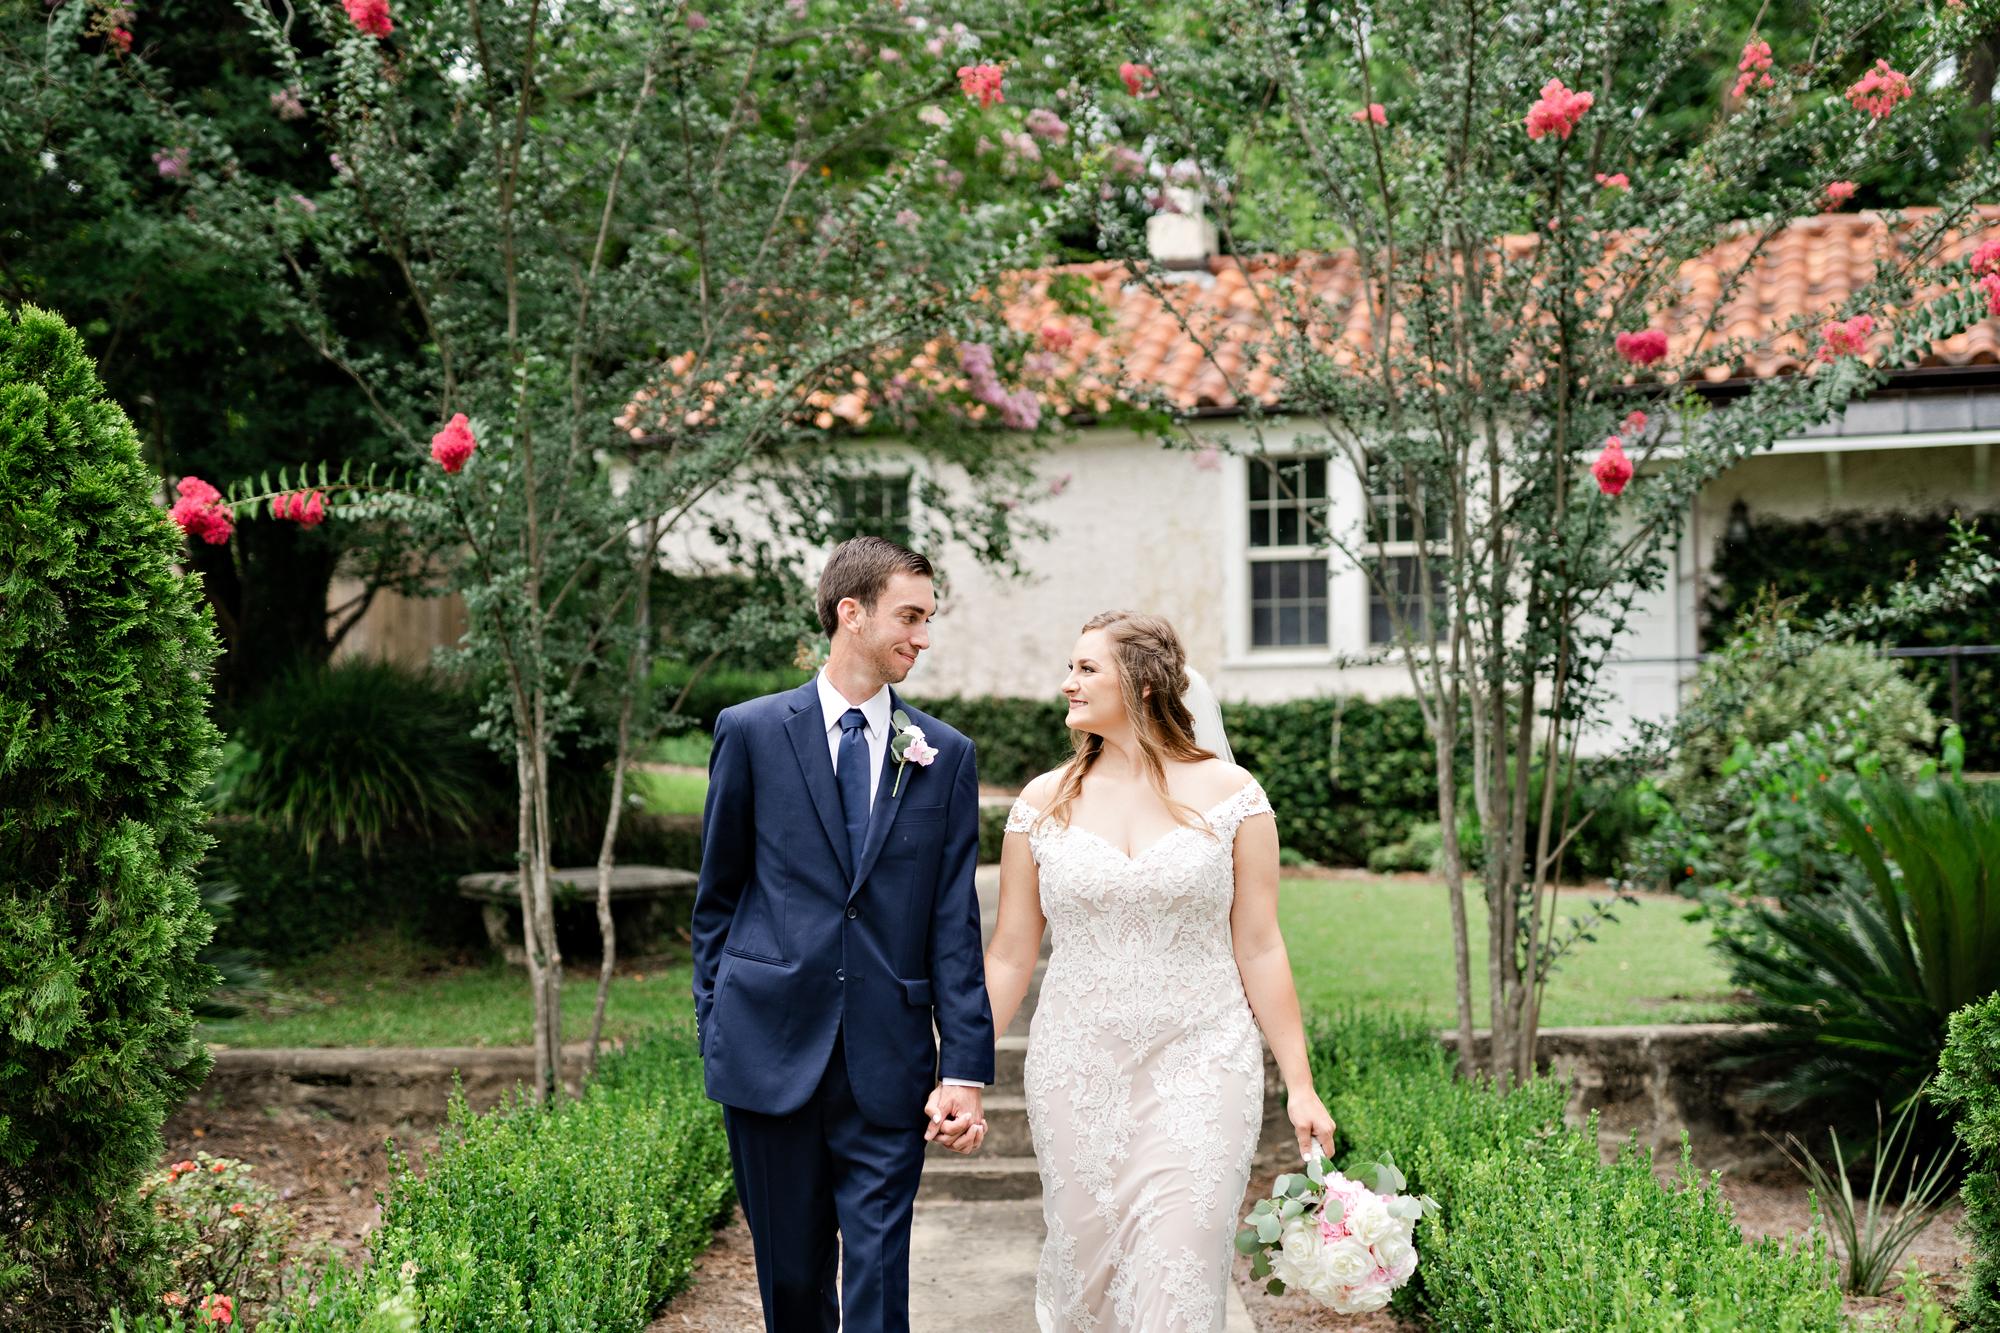 Alabama-Wedding-Photographer-Nick-Drollette-123.jpg